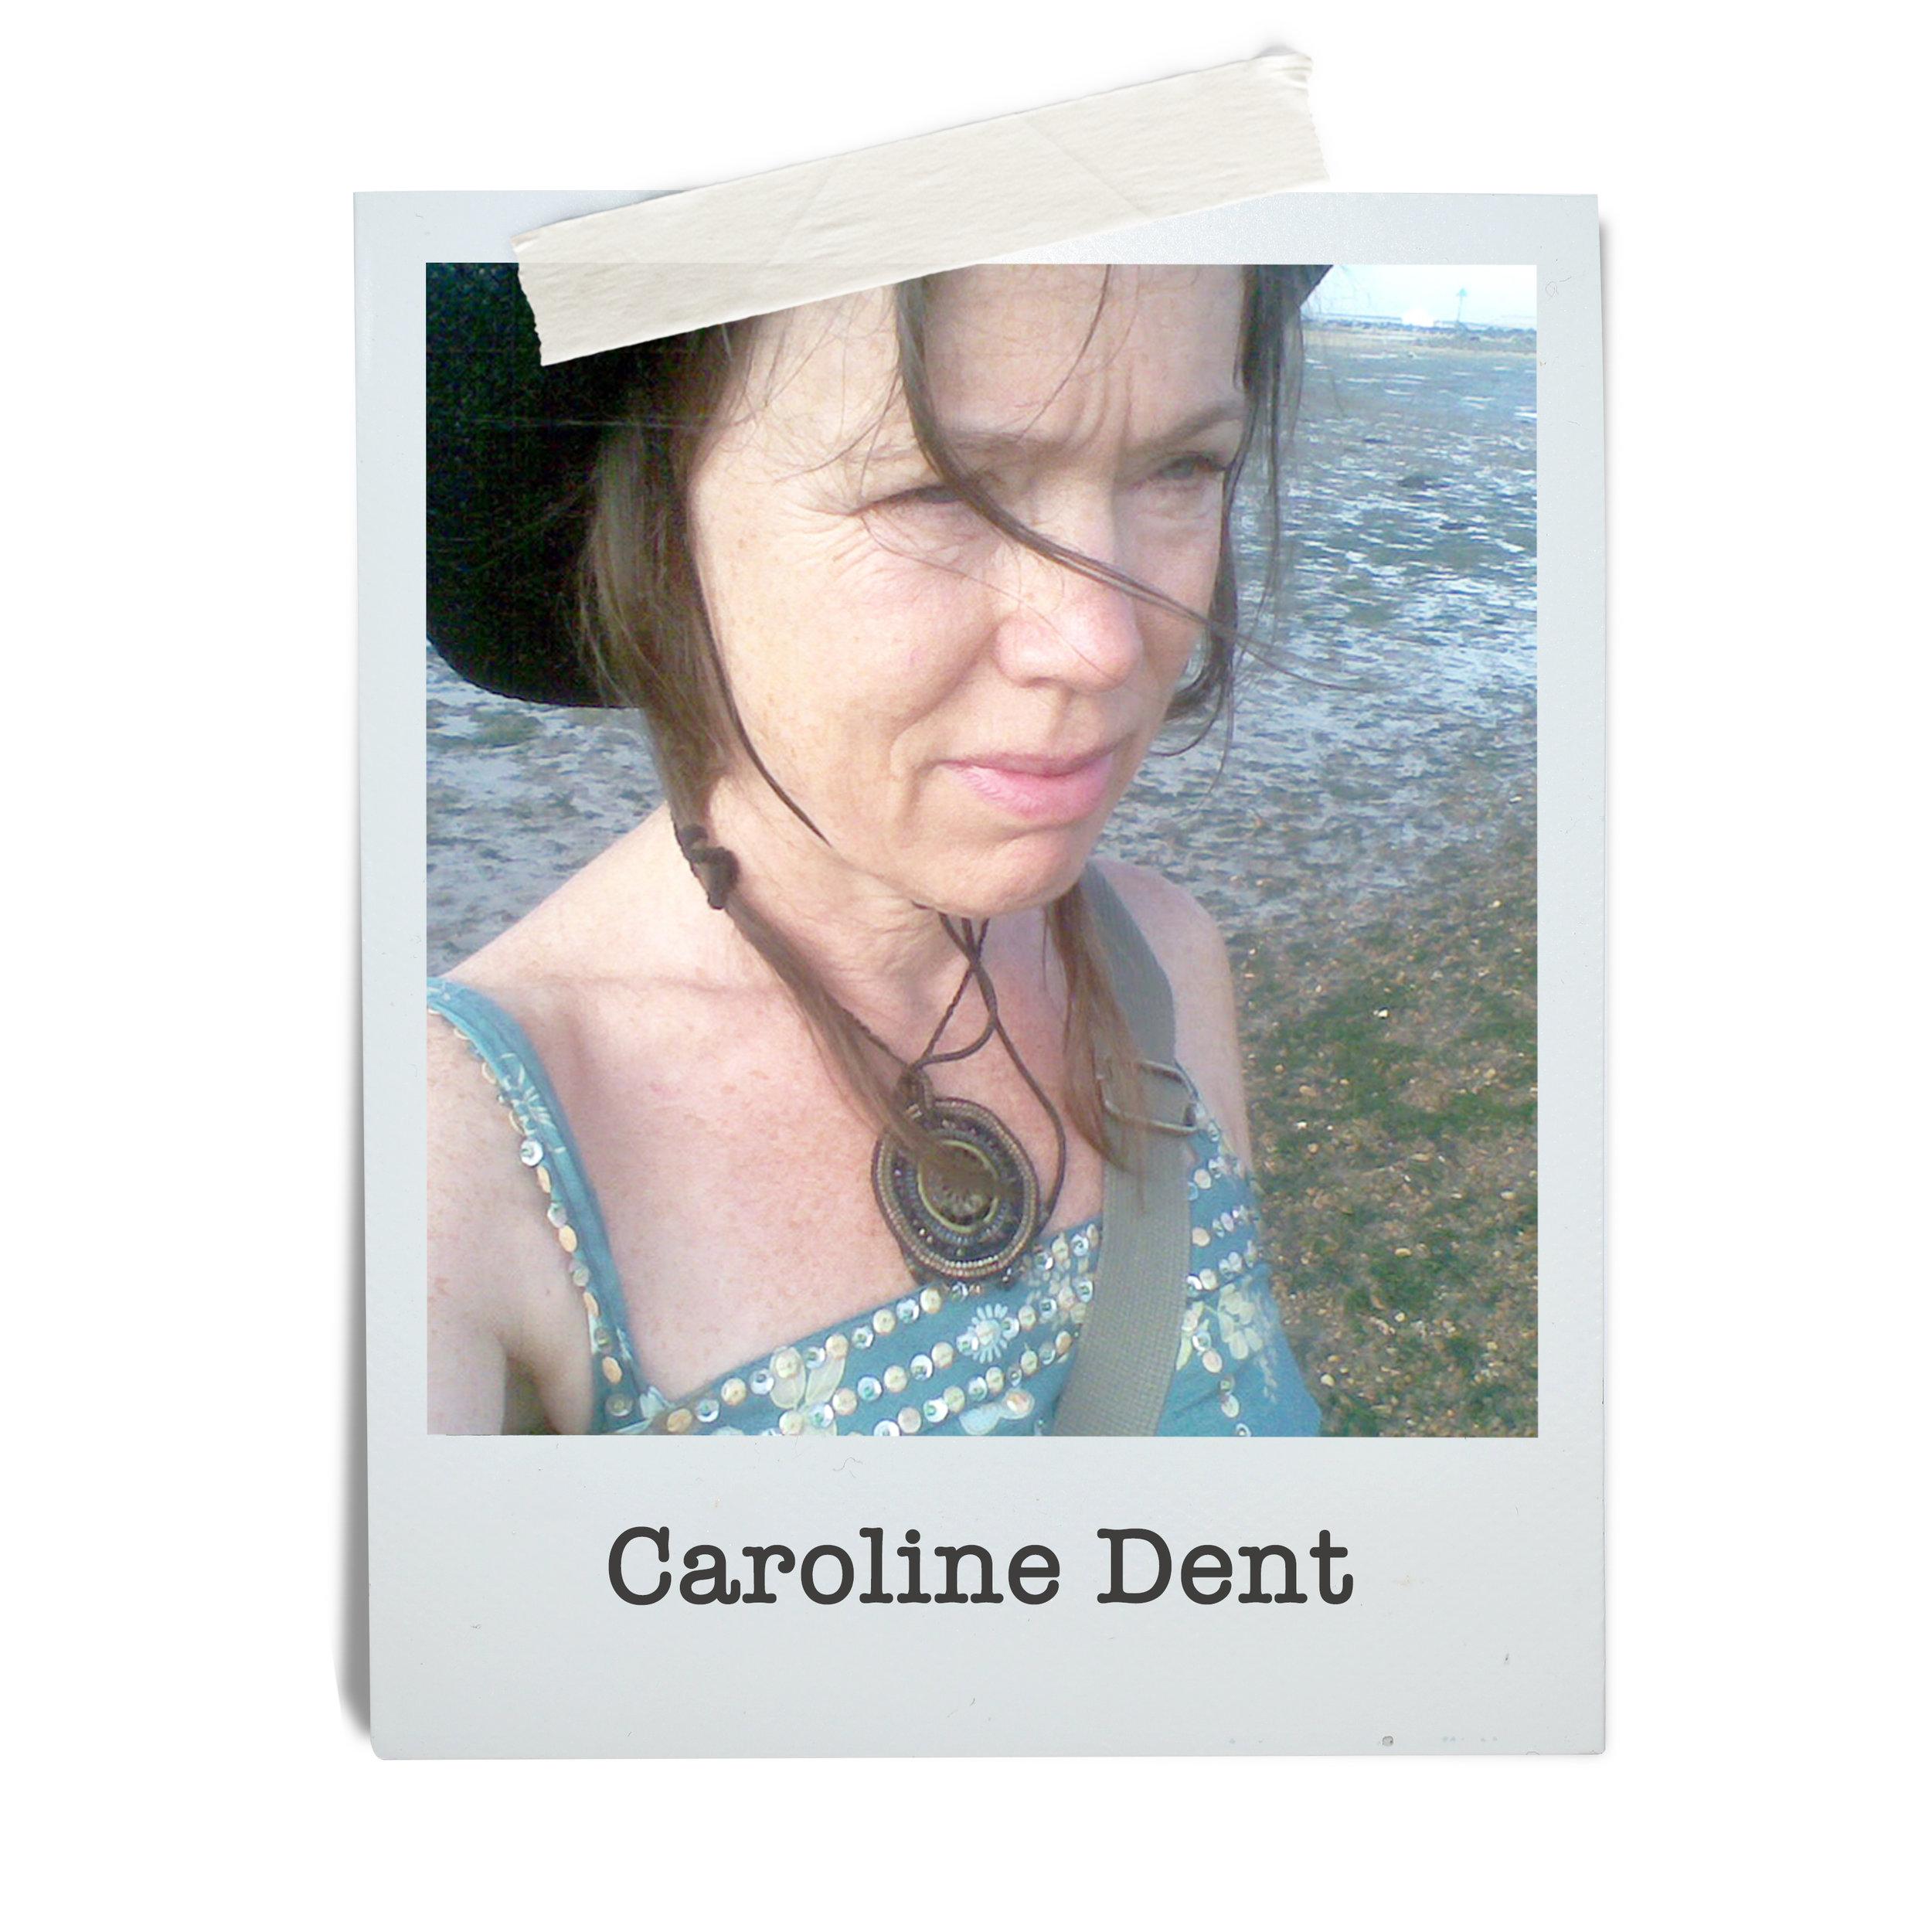 Caroline Dent